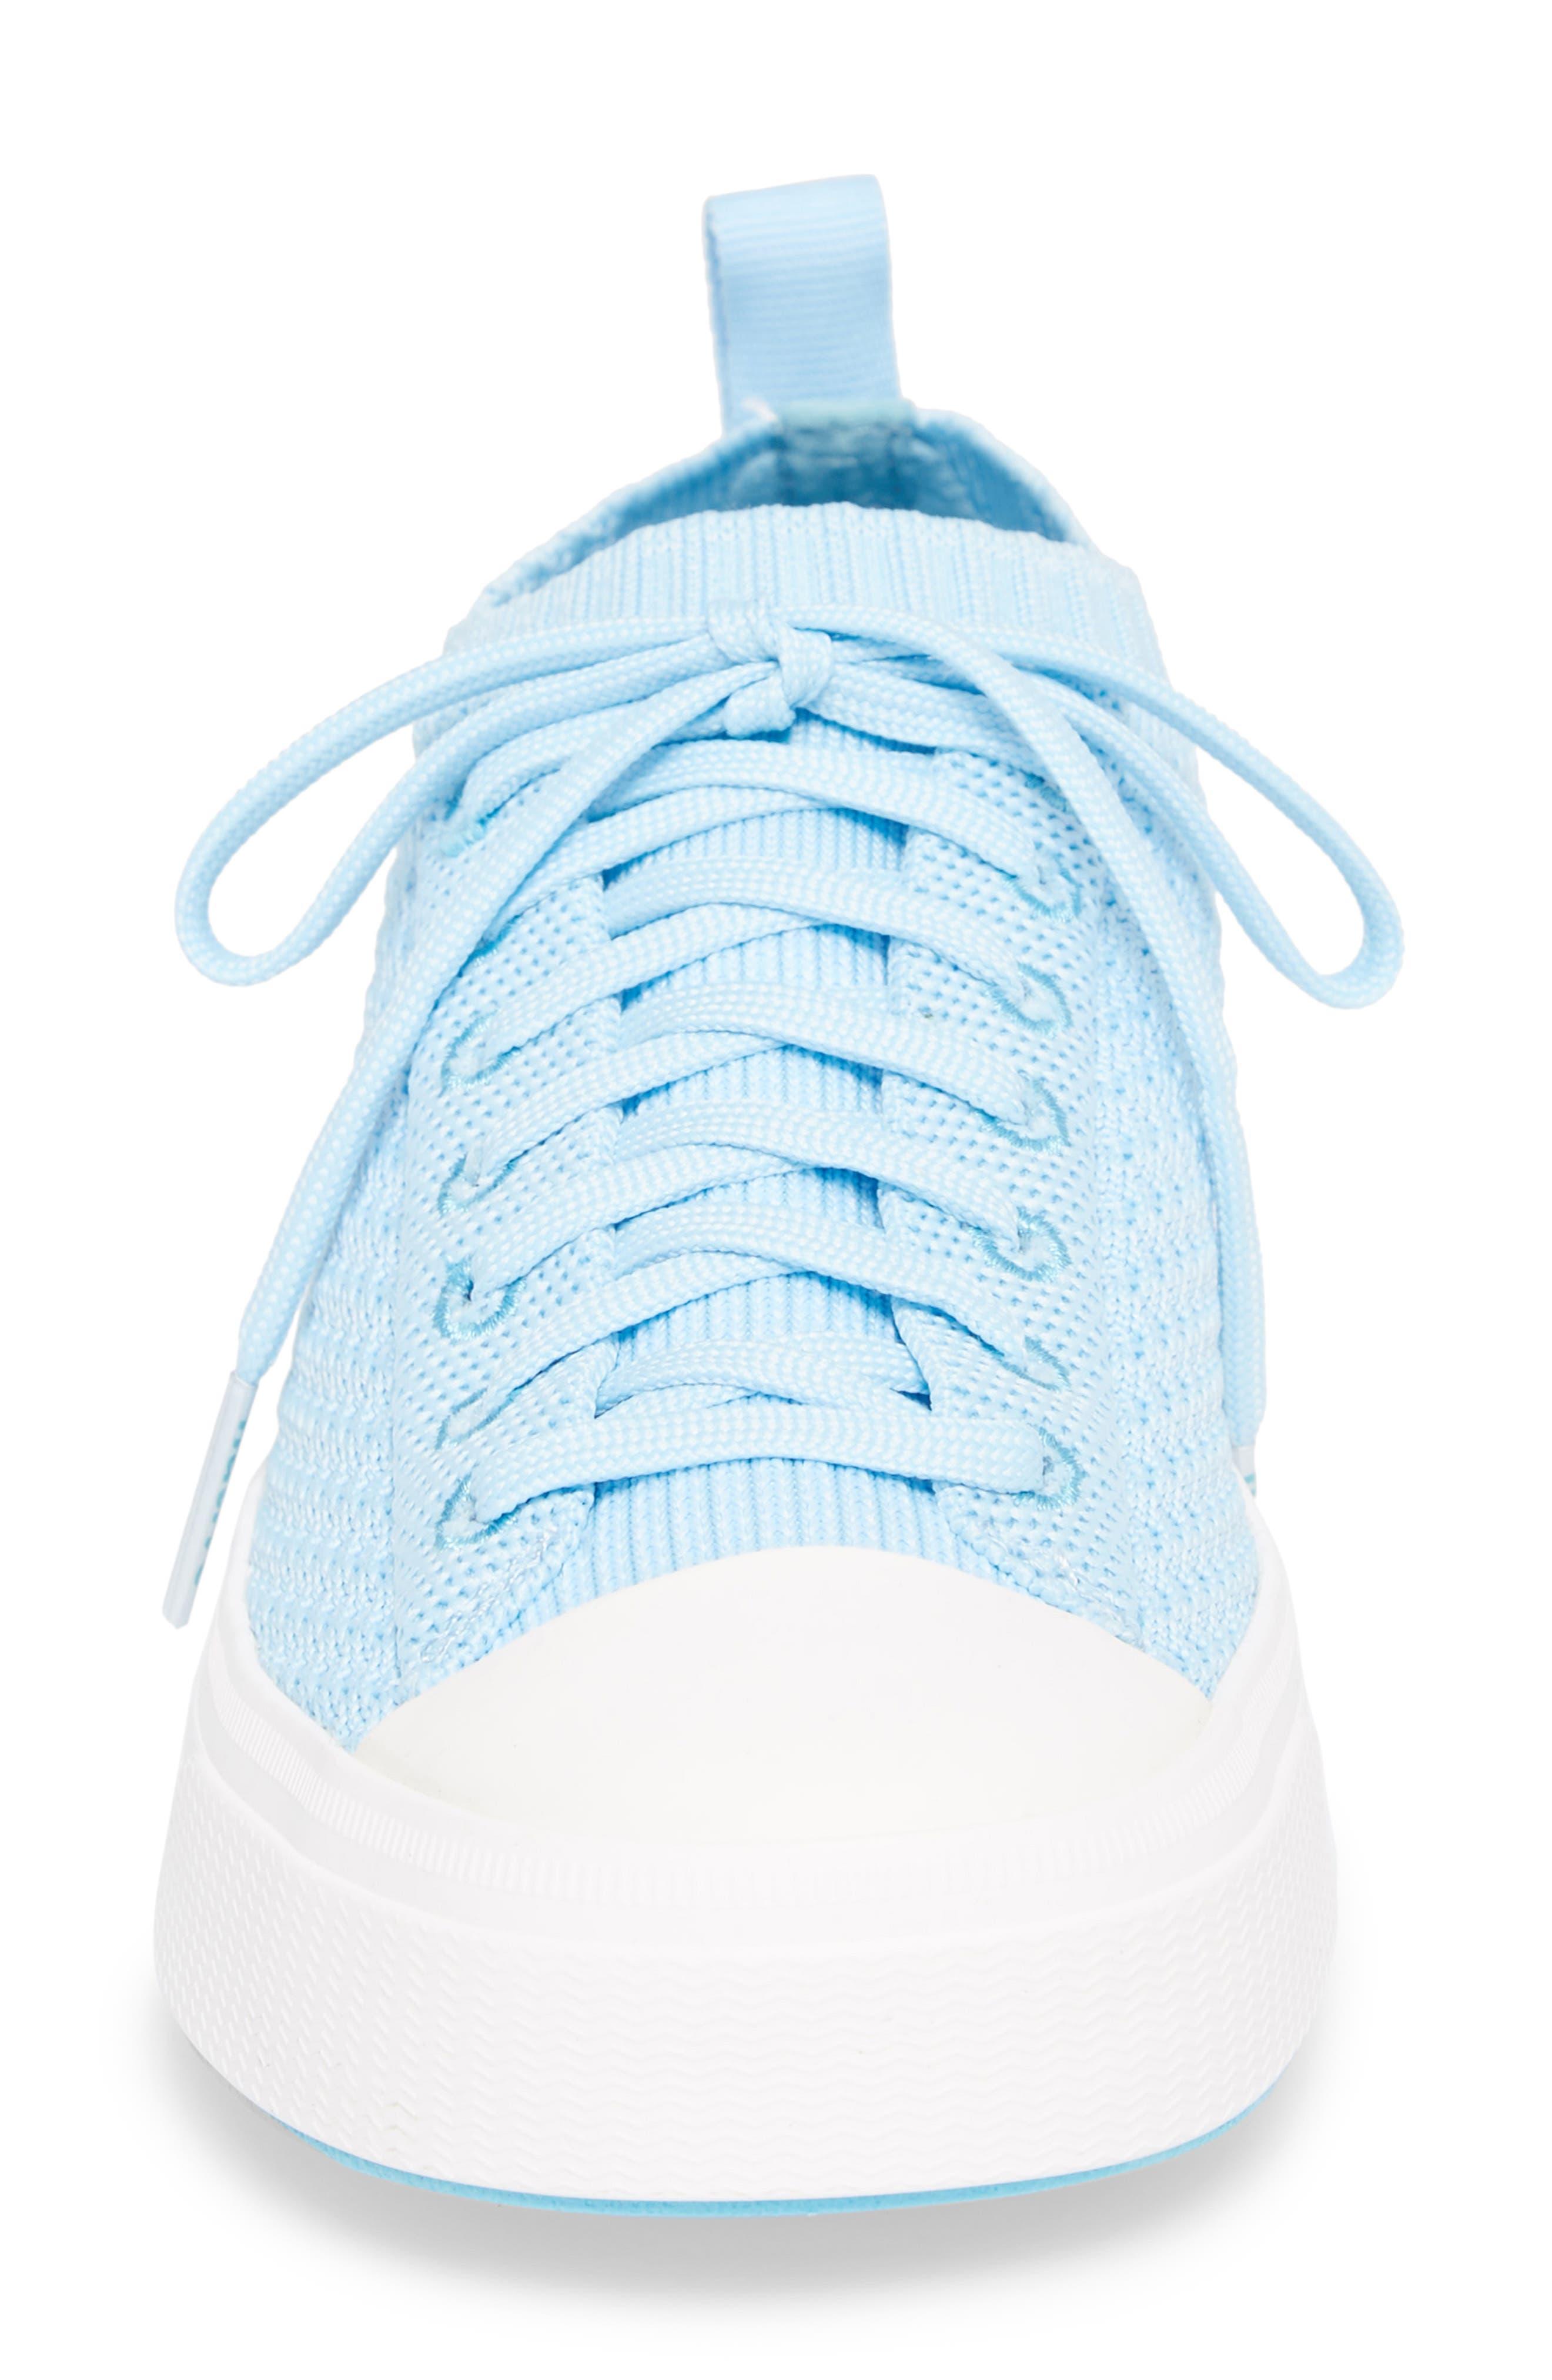 Jefferson 2.0 Liteknit Sneaker,                             Alternate thumbnail 4, color,                             Sky Blue/ Shell White